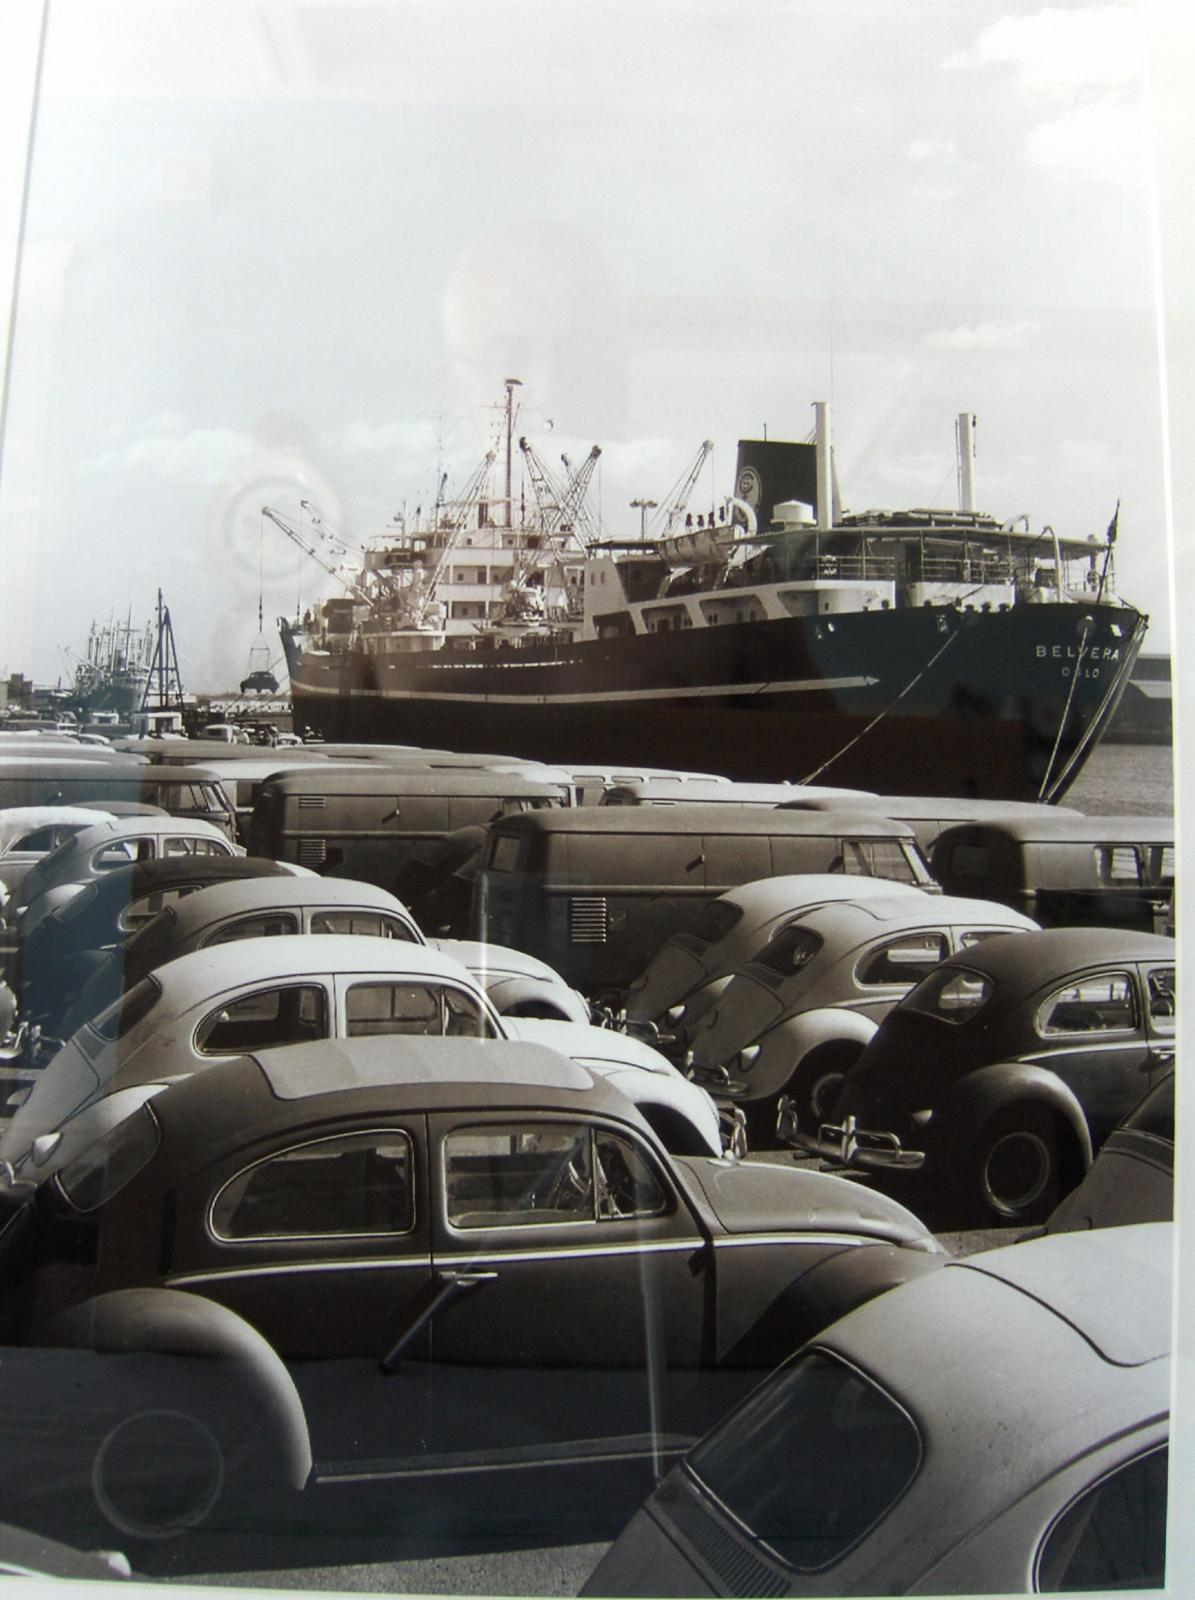 Dockside View - Port Unknown